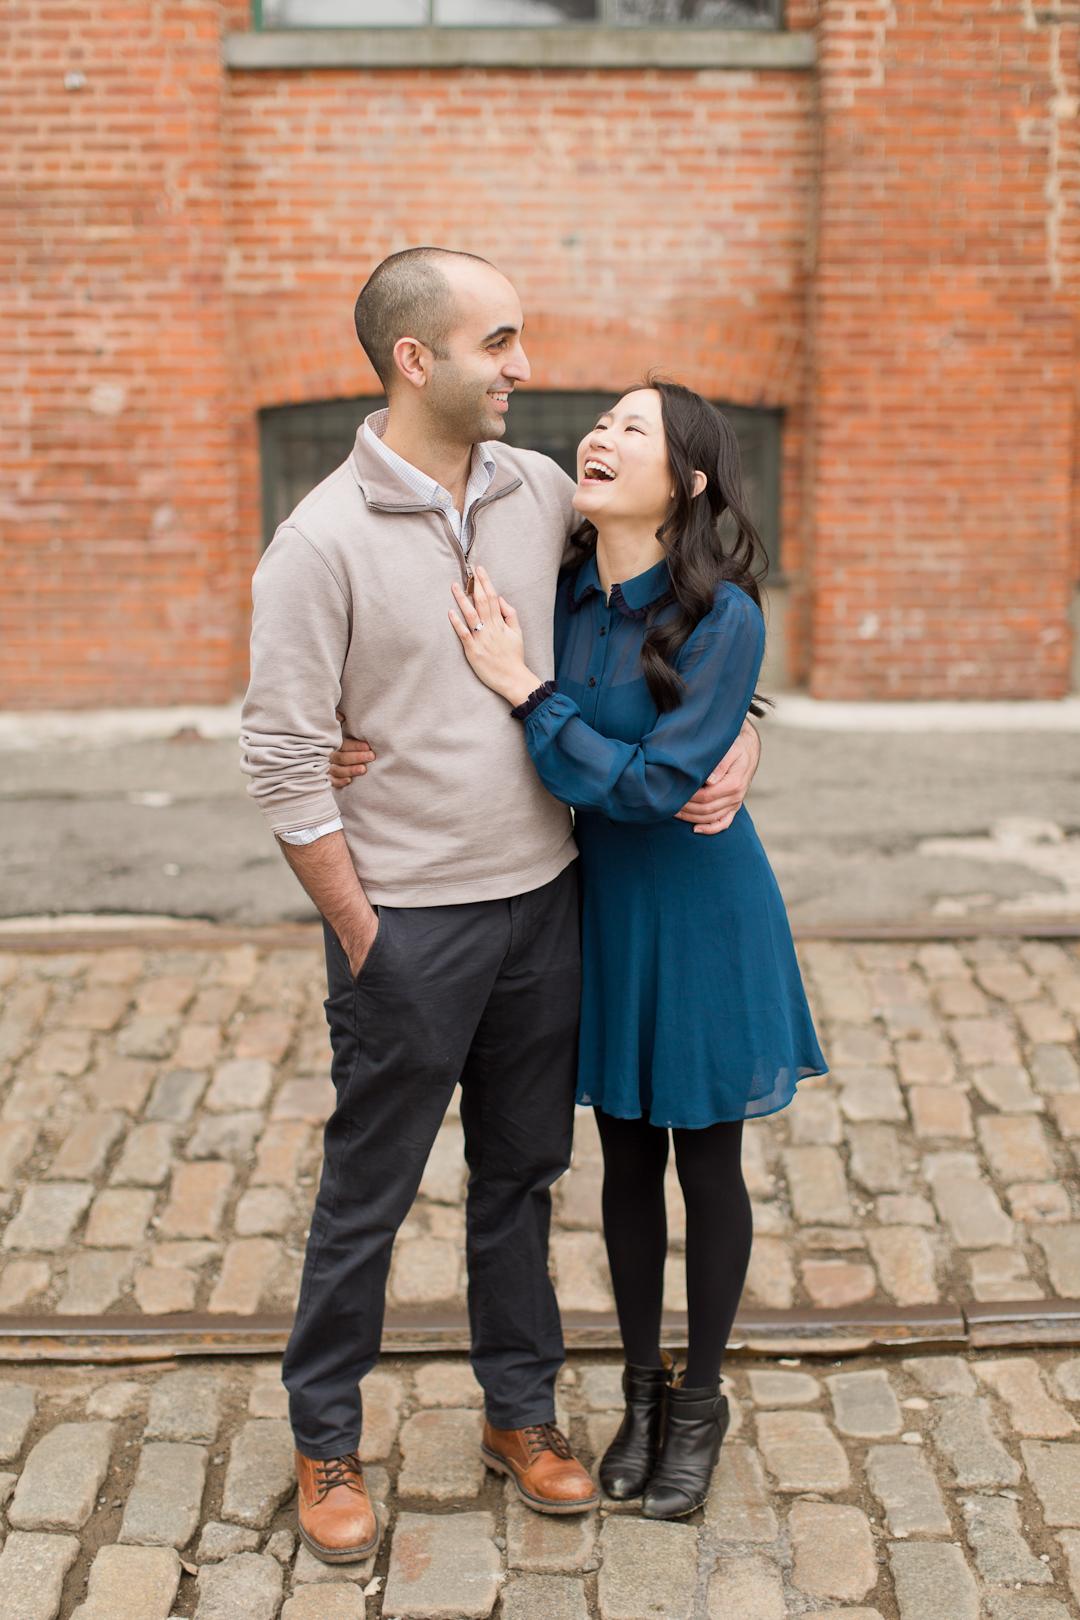 Melissa Kruse Photography - Kristine & David Engagement Photos-26.jpg